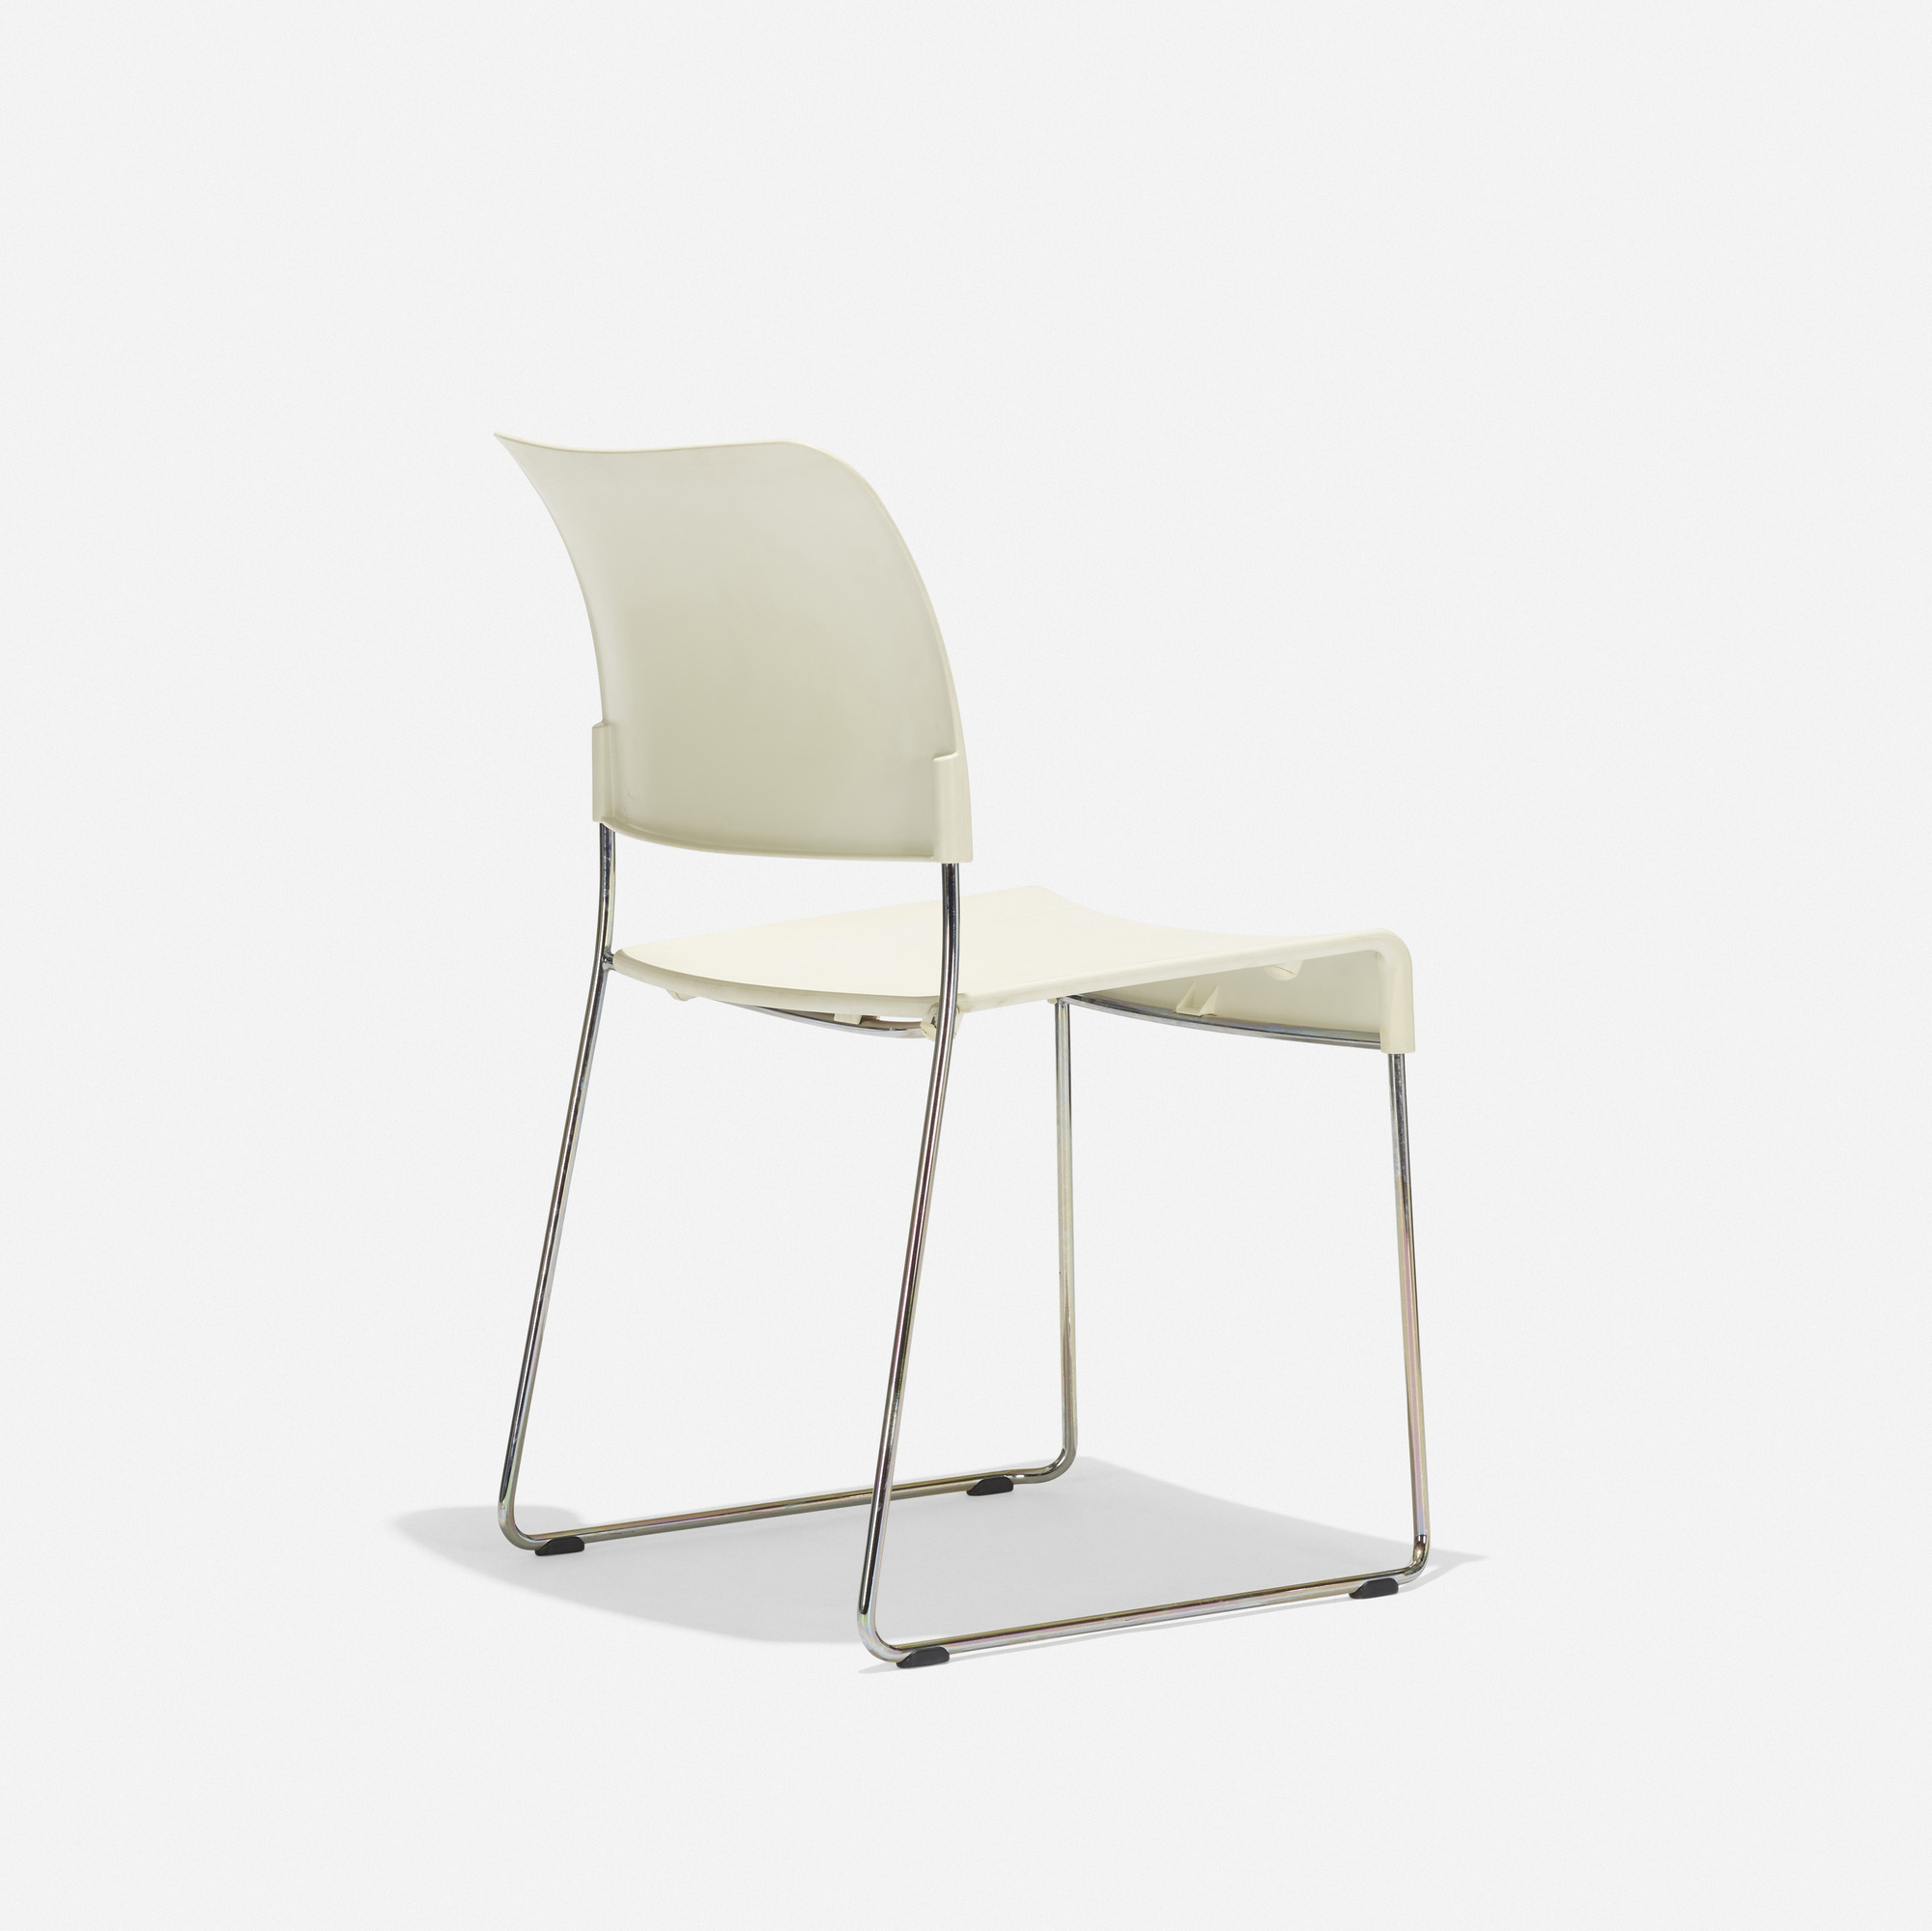 115: Jasper Morrison / Sim chair (2 of 3)